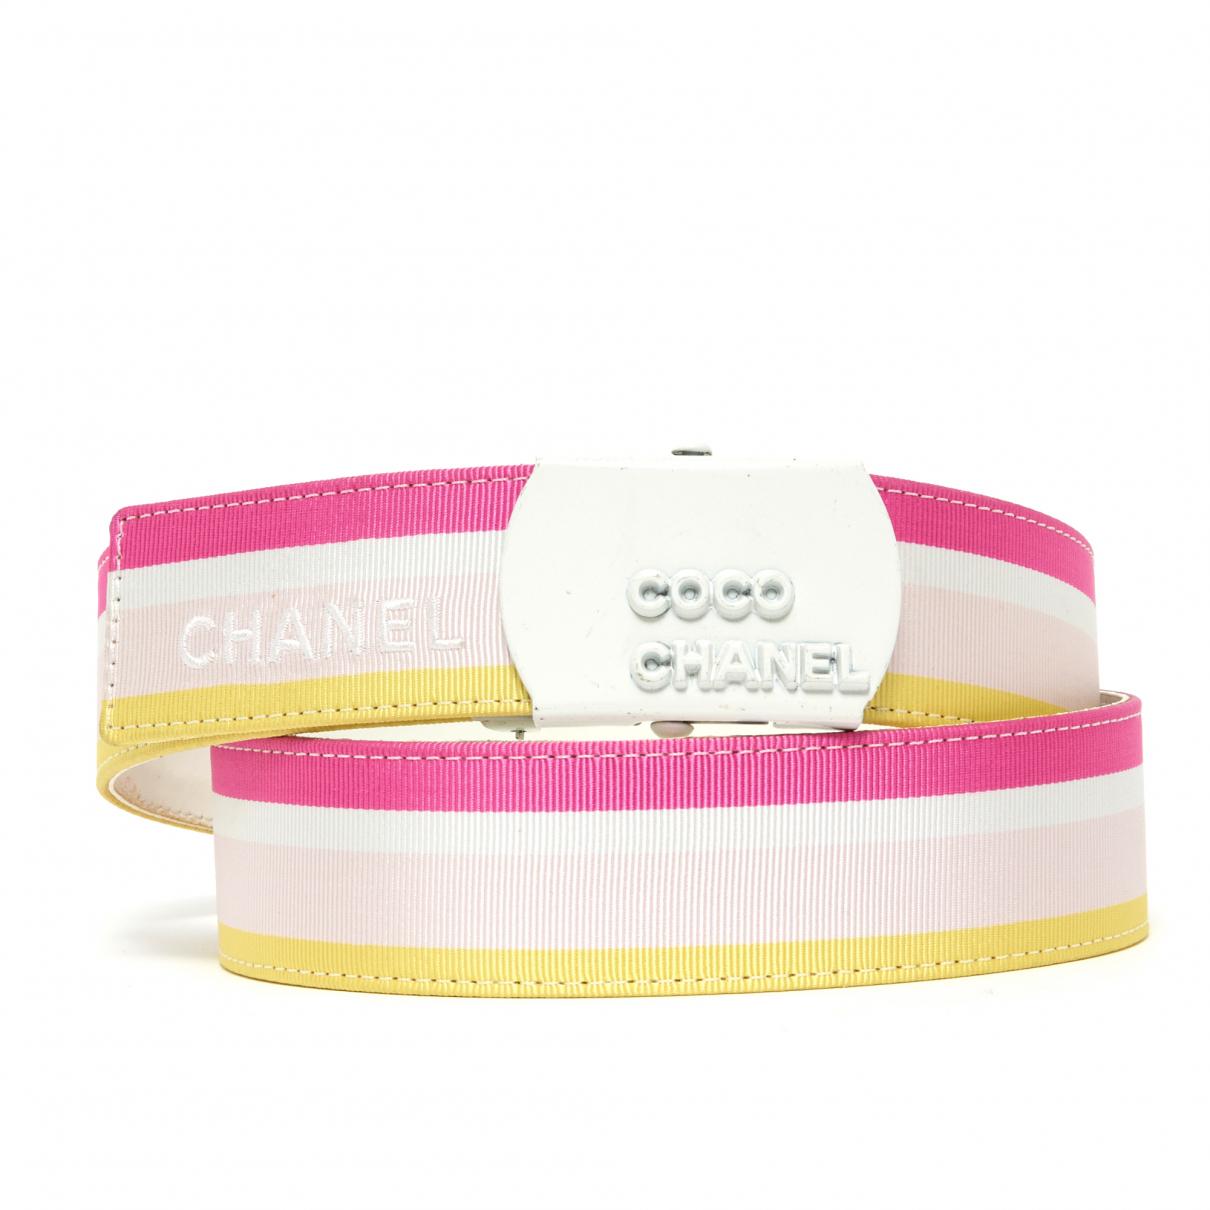 Chanel \N Leather belt for Women 80 cm